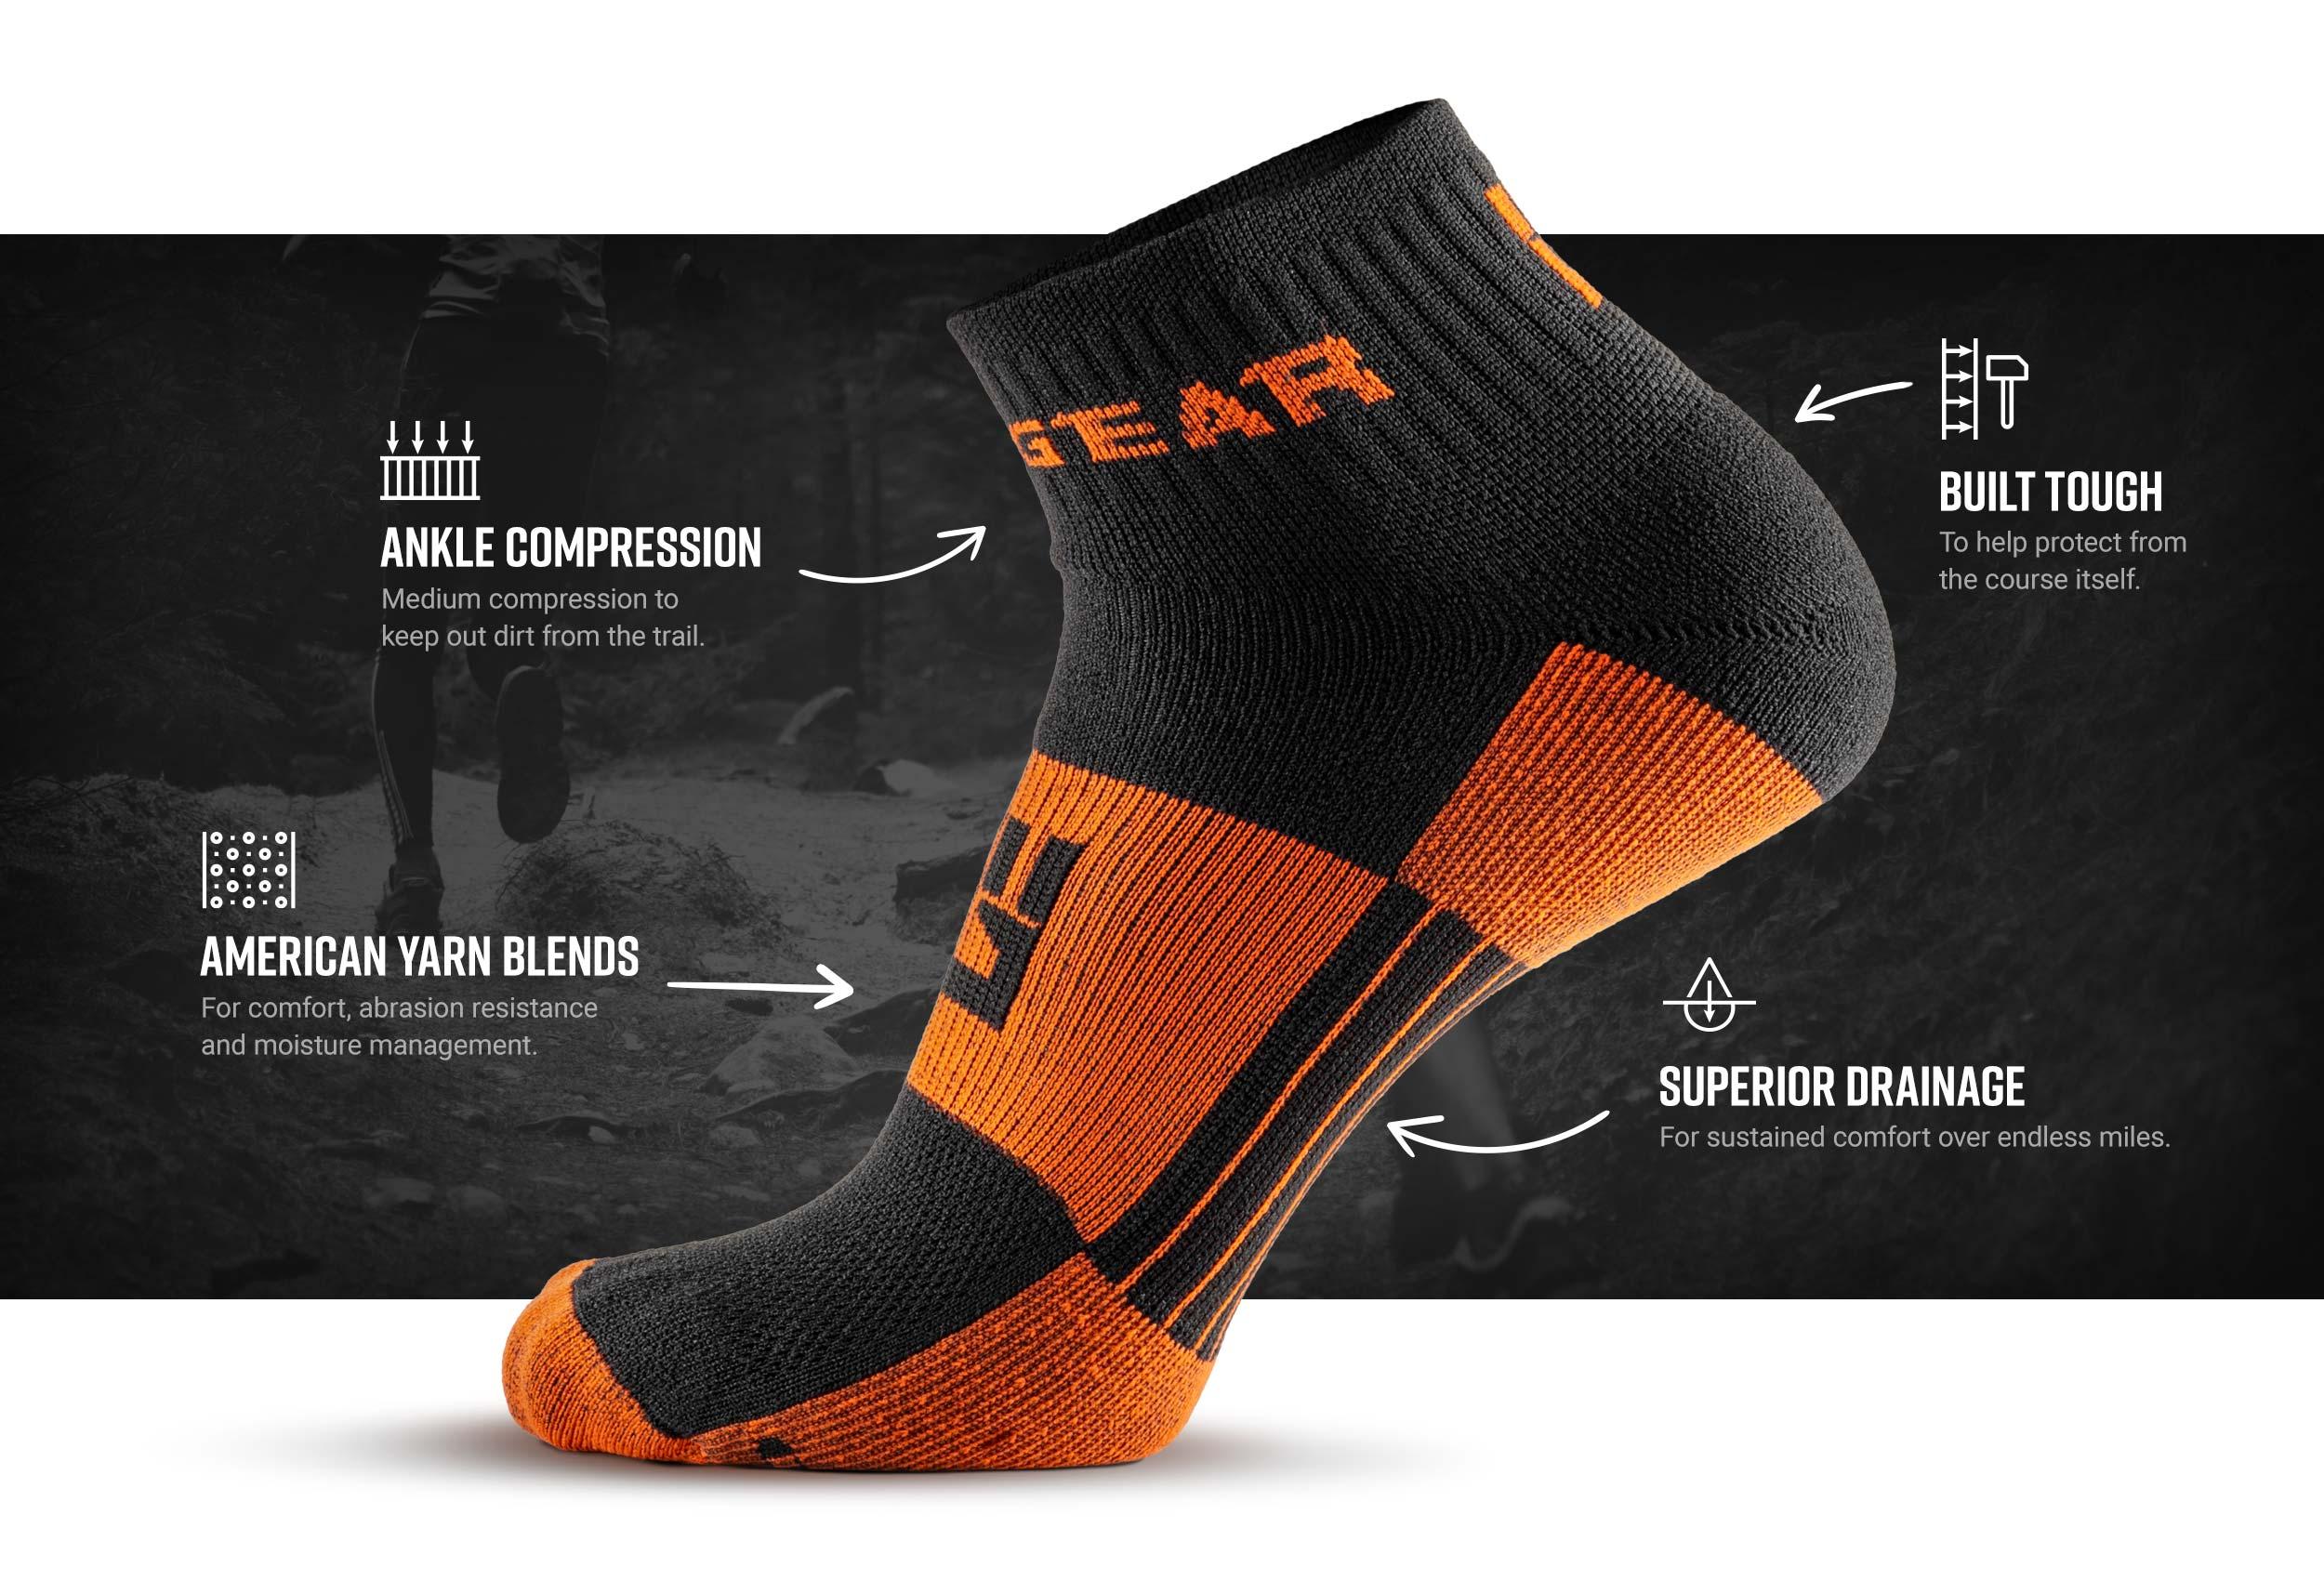 Infographic of 1/4 Crew Socks - Black/Orange (2 pair pack)